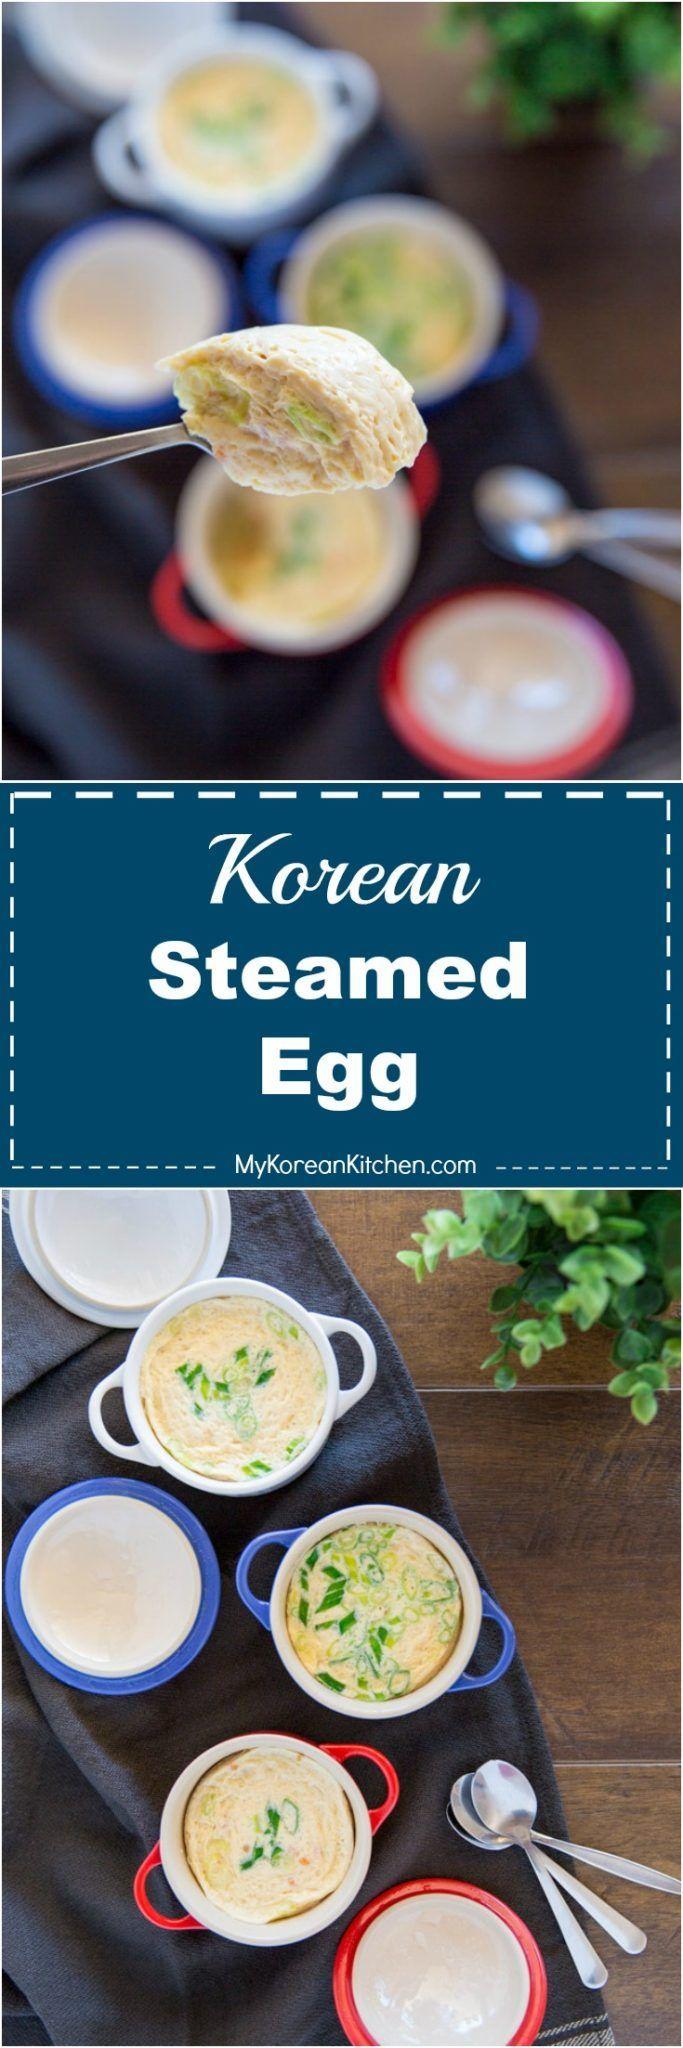 The Ultimate Korean Steamed Egg Recipe. Learn how to make Korean steamed egg (gyeran jjim) in three different ways! | MyKoreanKitchen.com via @mykoreankitchen